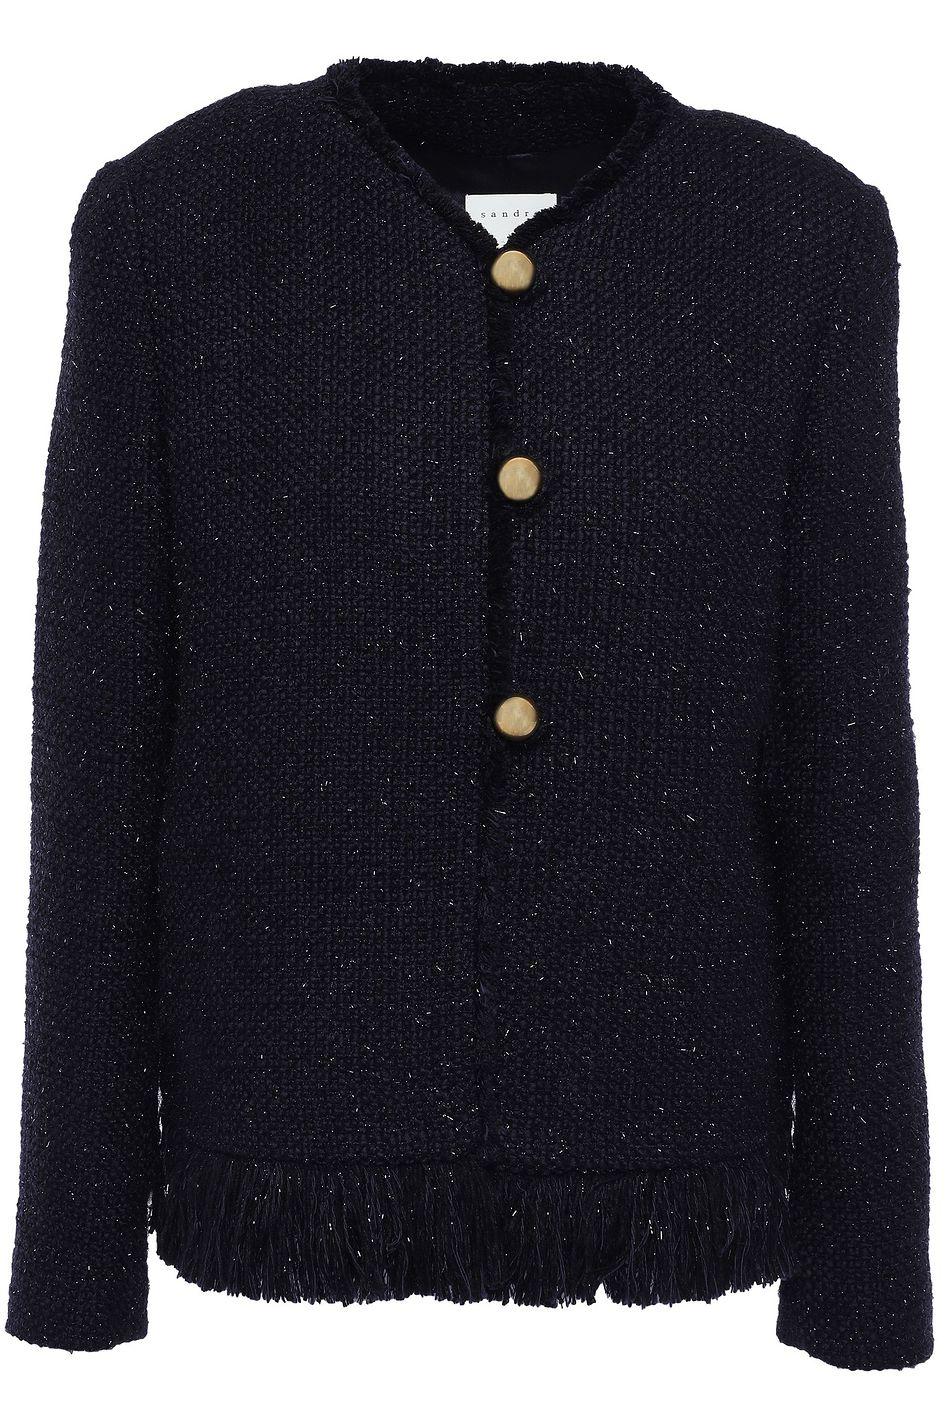 Crown Princess Mary was wearing Sandro Paris fringe-trimmed metallic tweed jacket